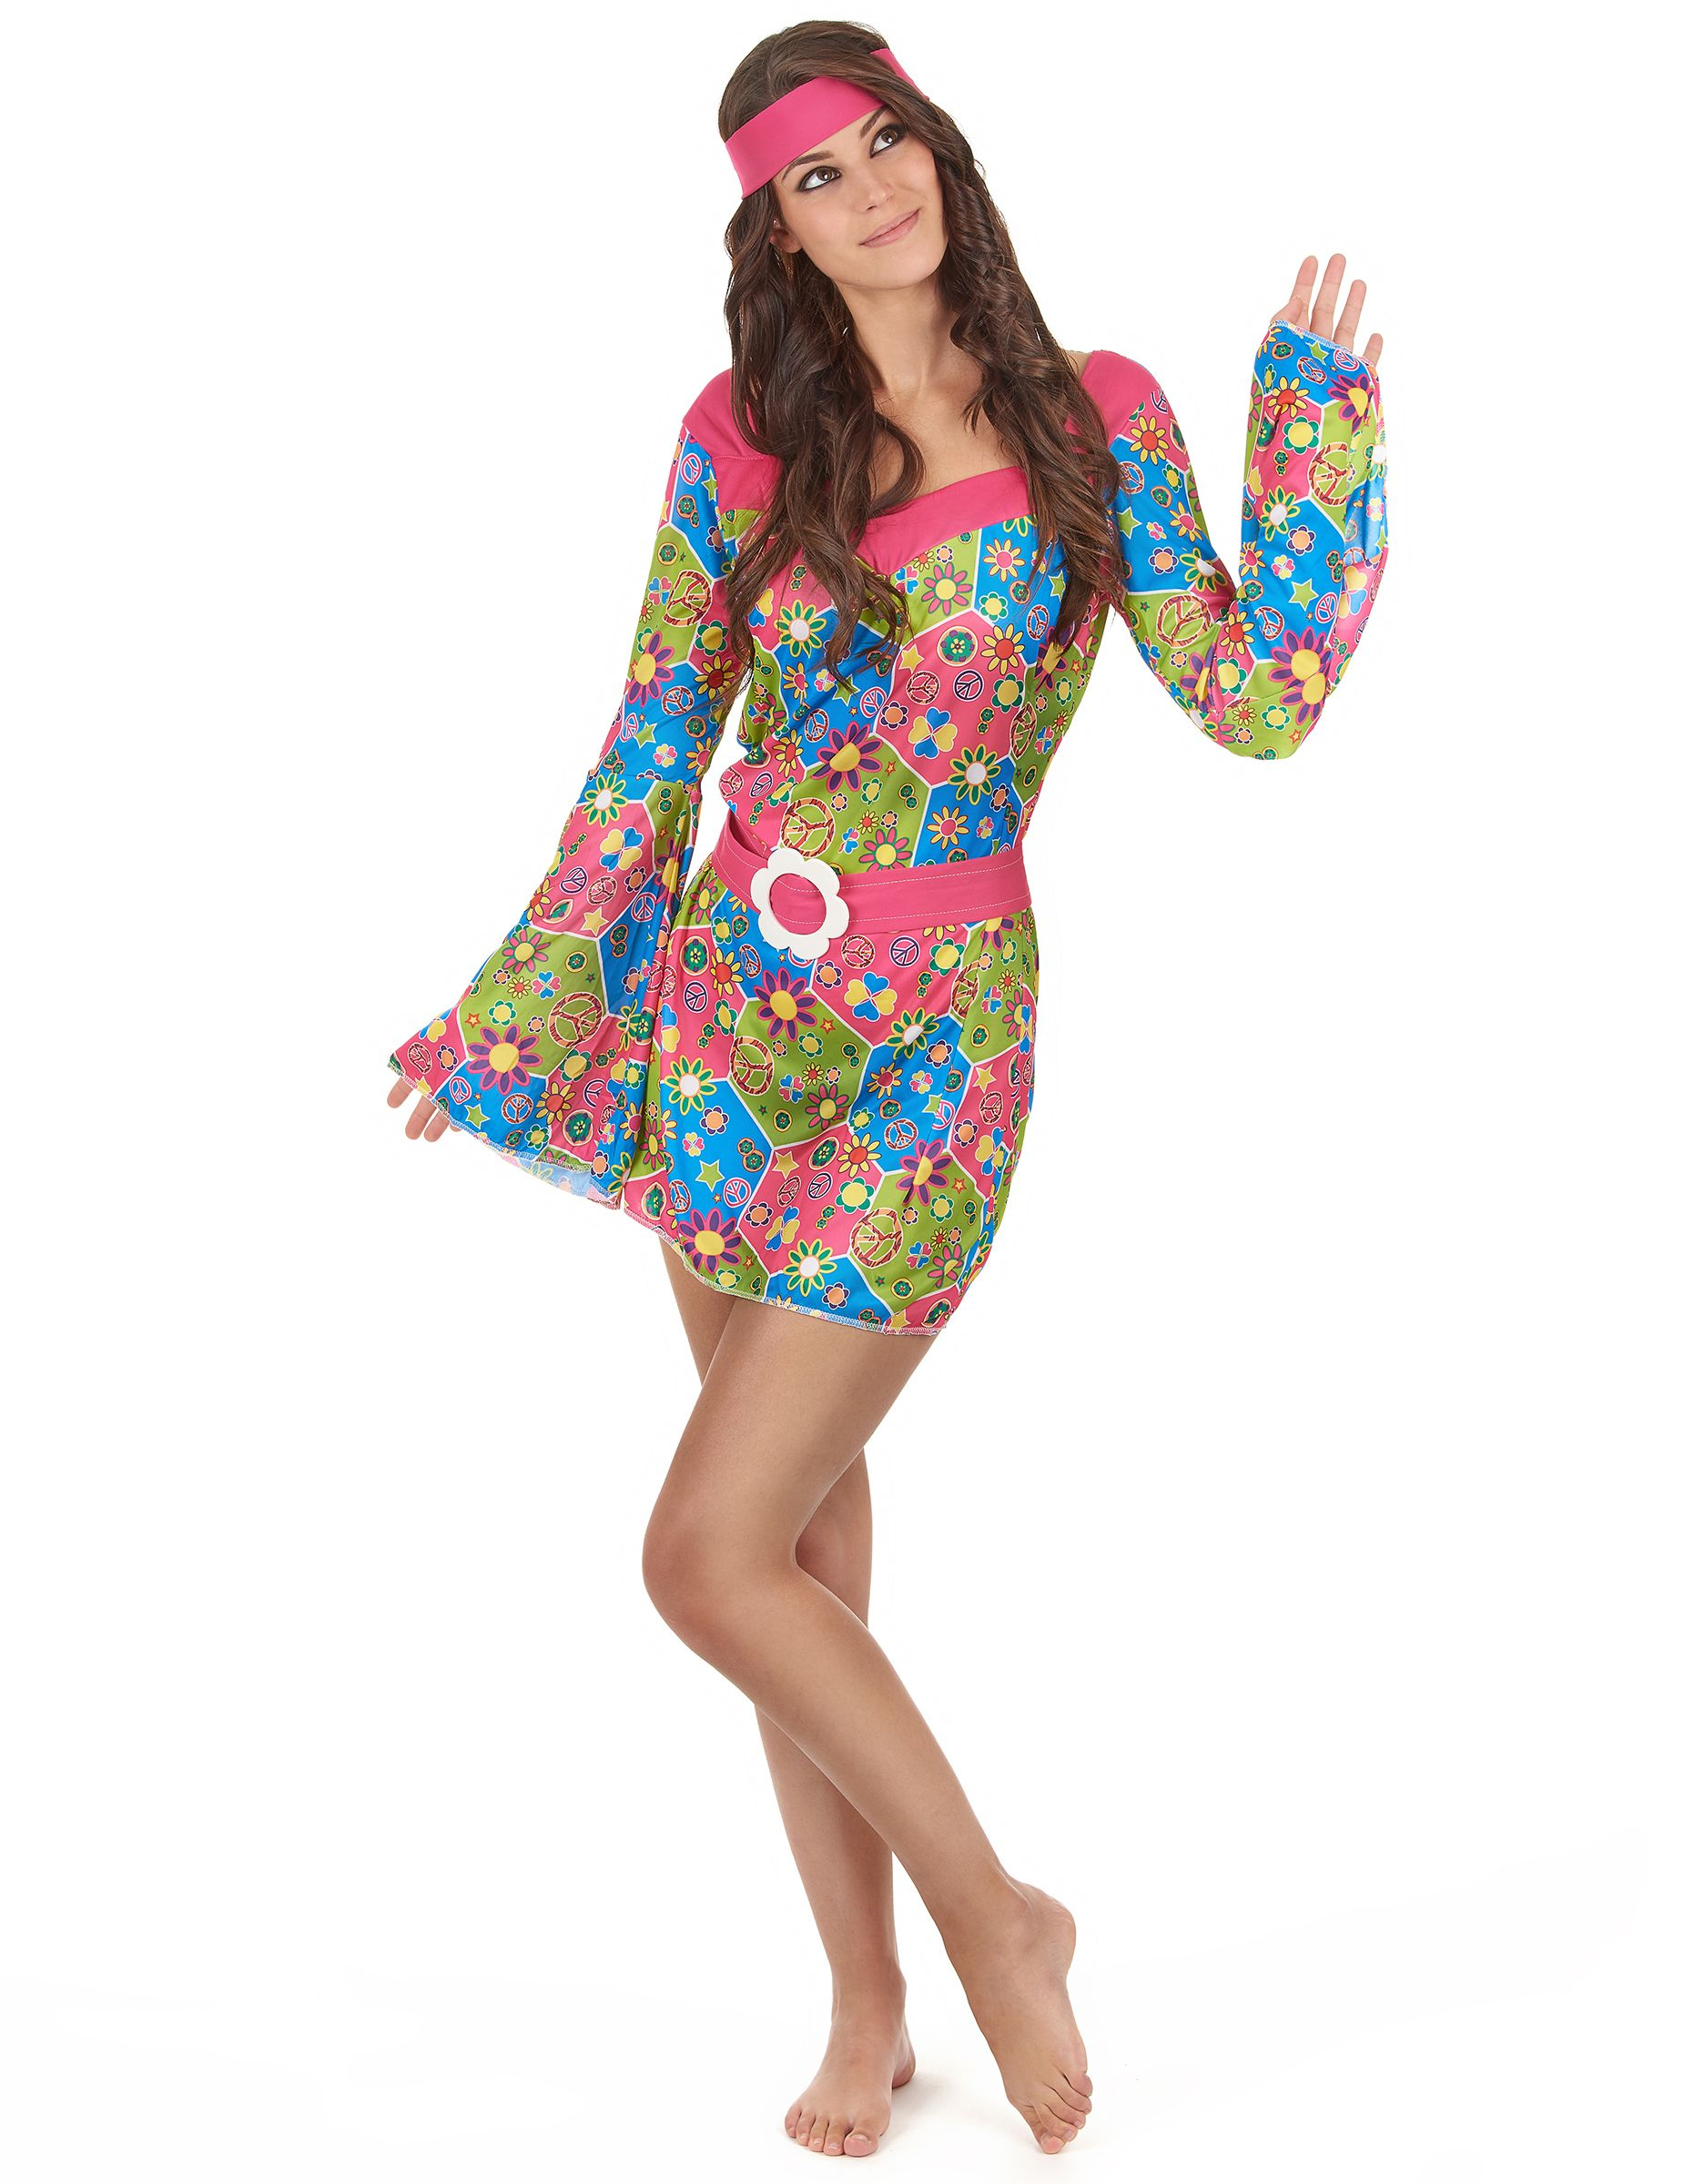 d00af19f1cd1e Hippie-Damenkostüm Flower-Power-Kleid bunt